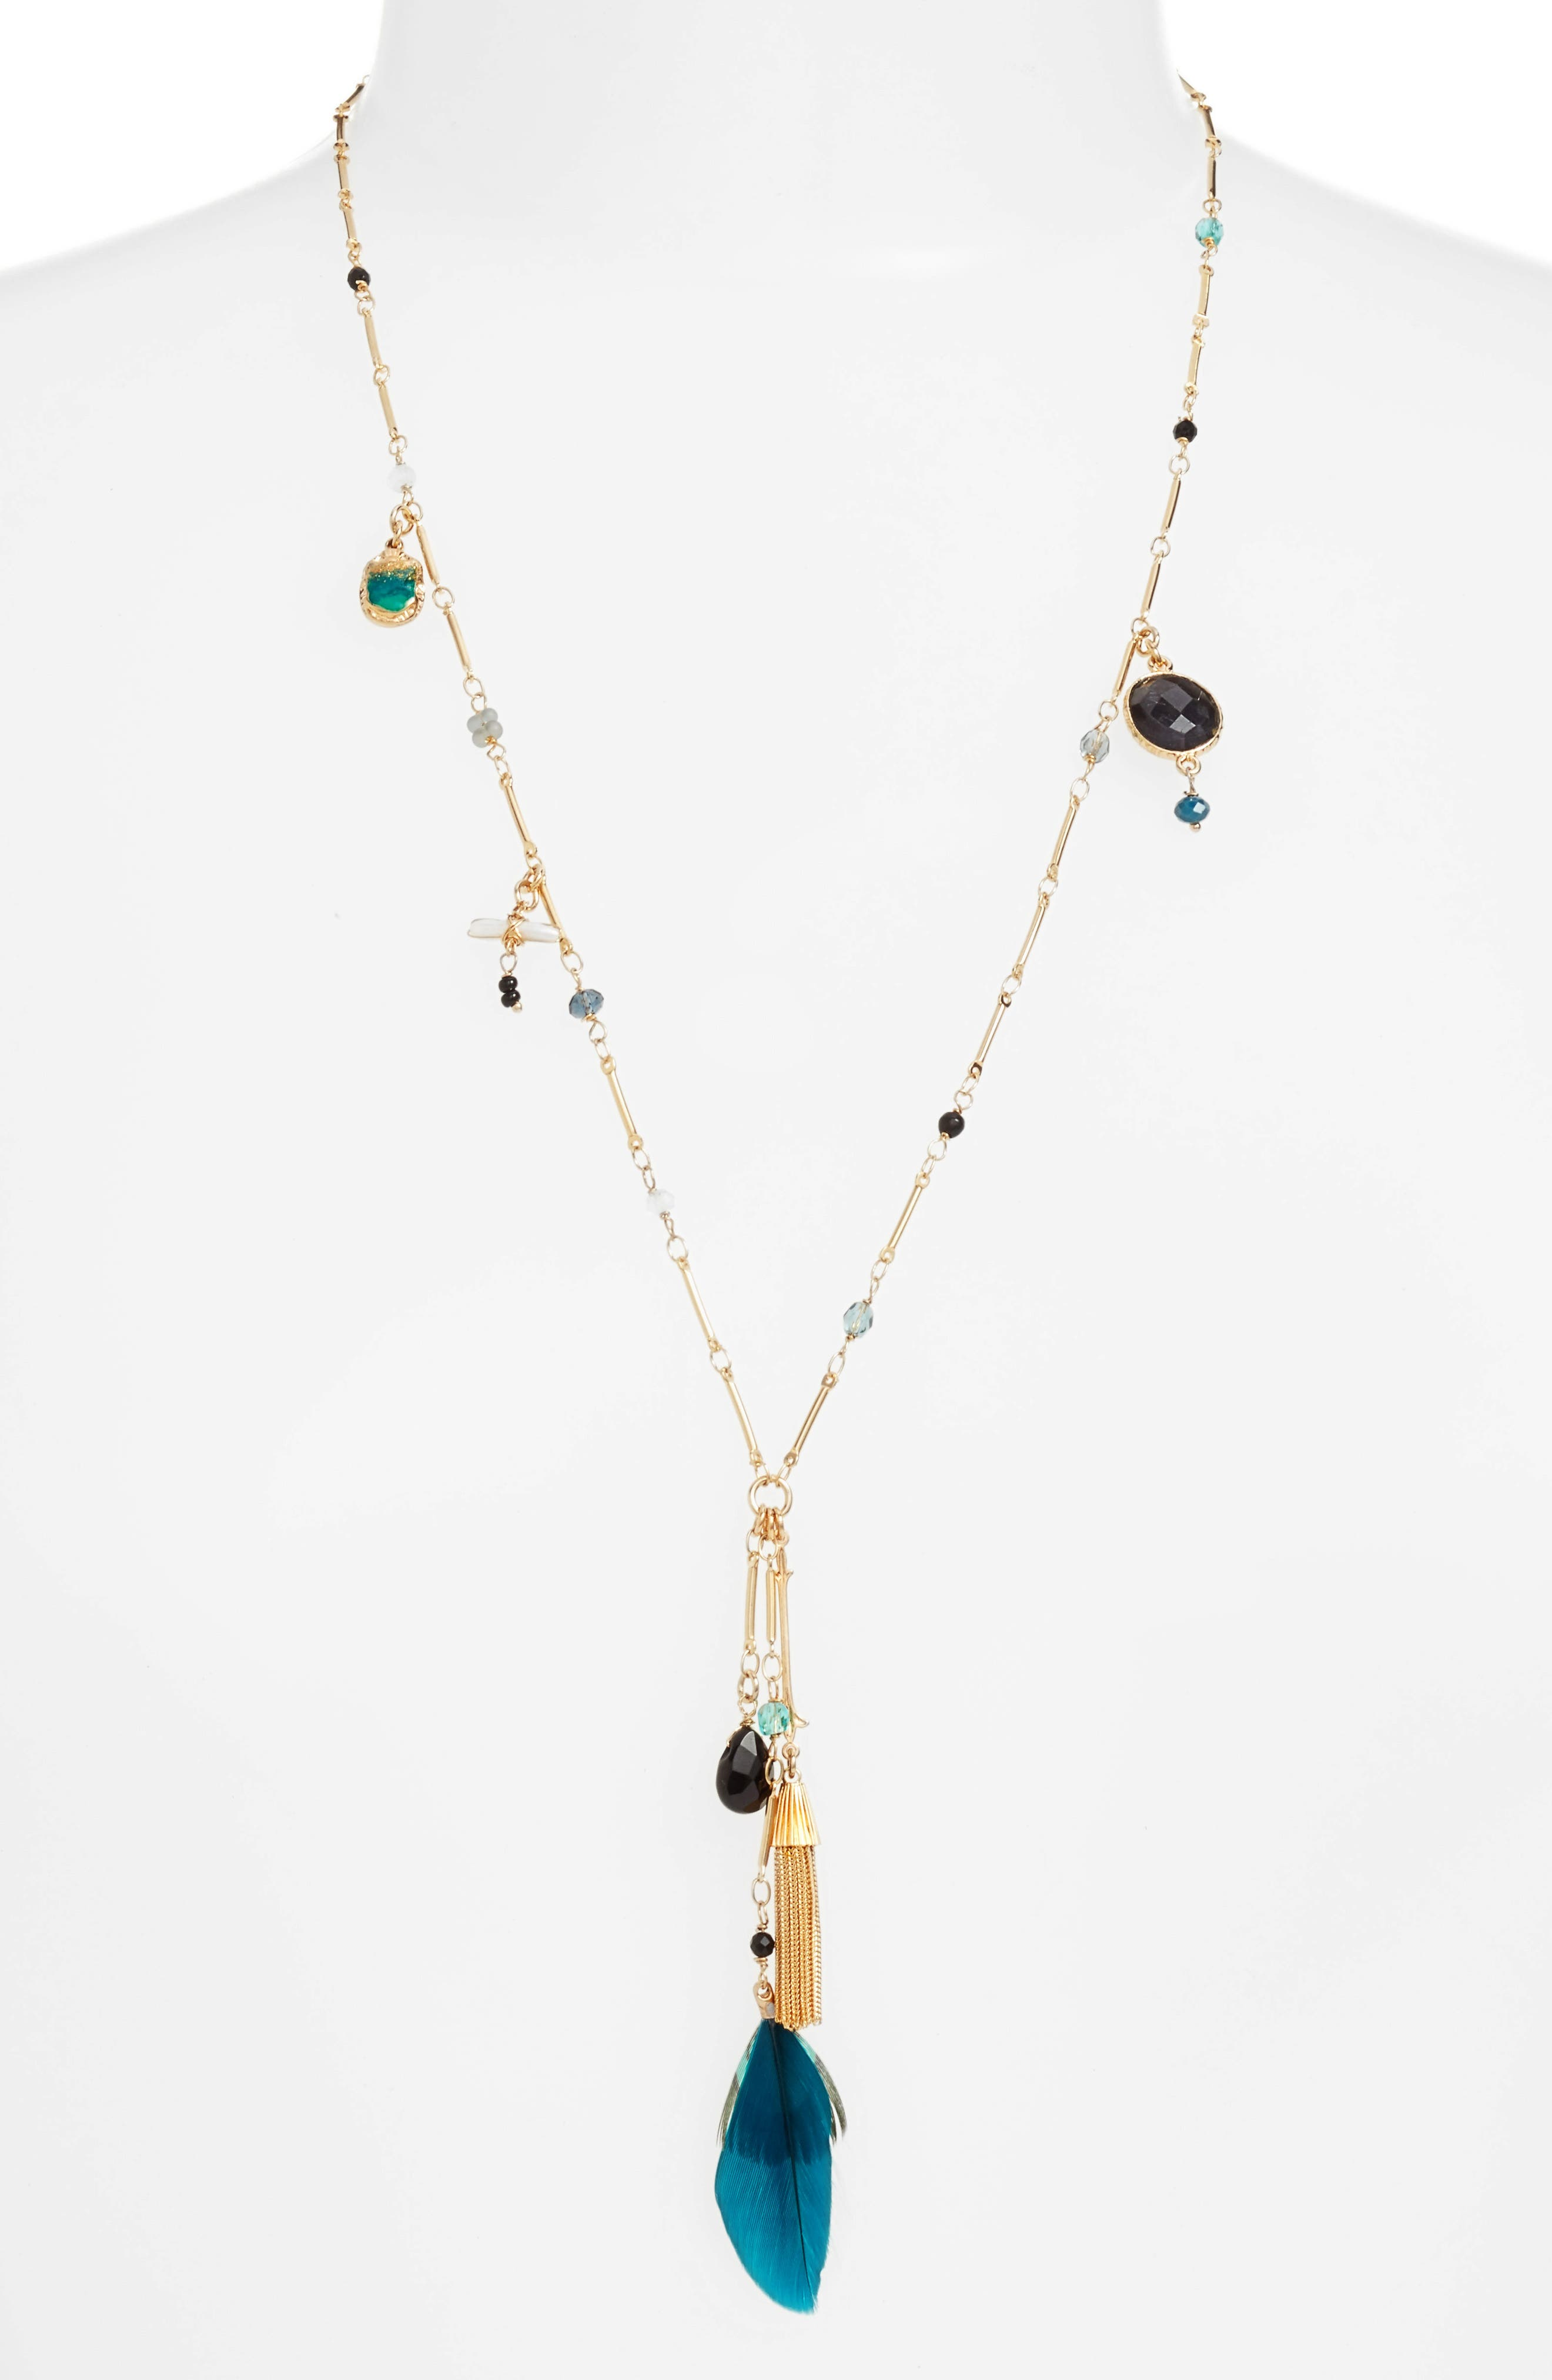 California Pendant Necklace,                         Main,                         color, Blue Teal/ Gold